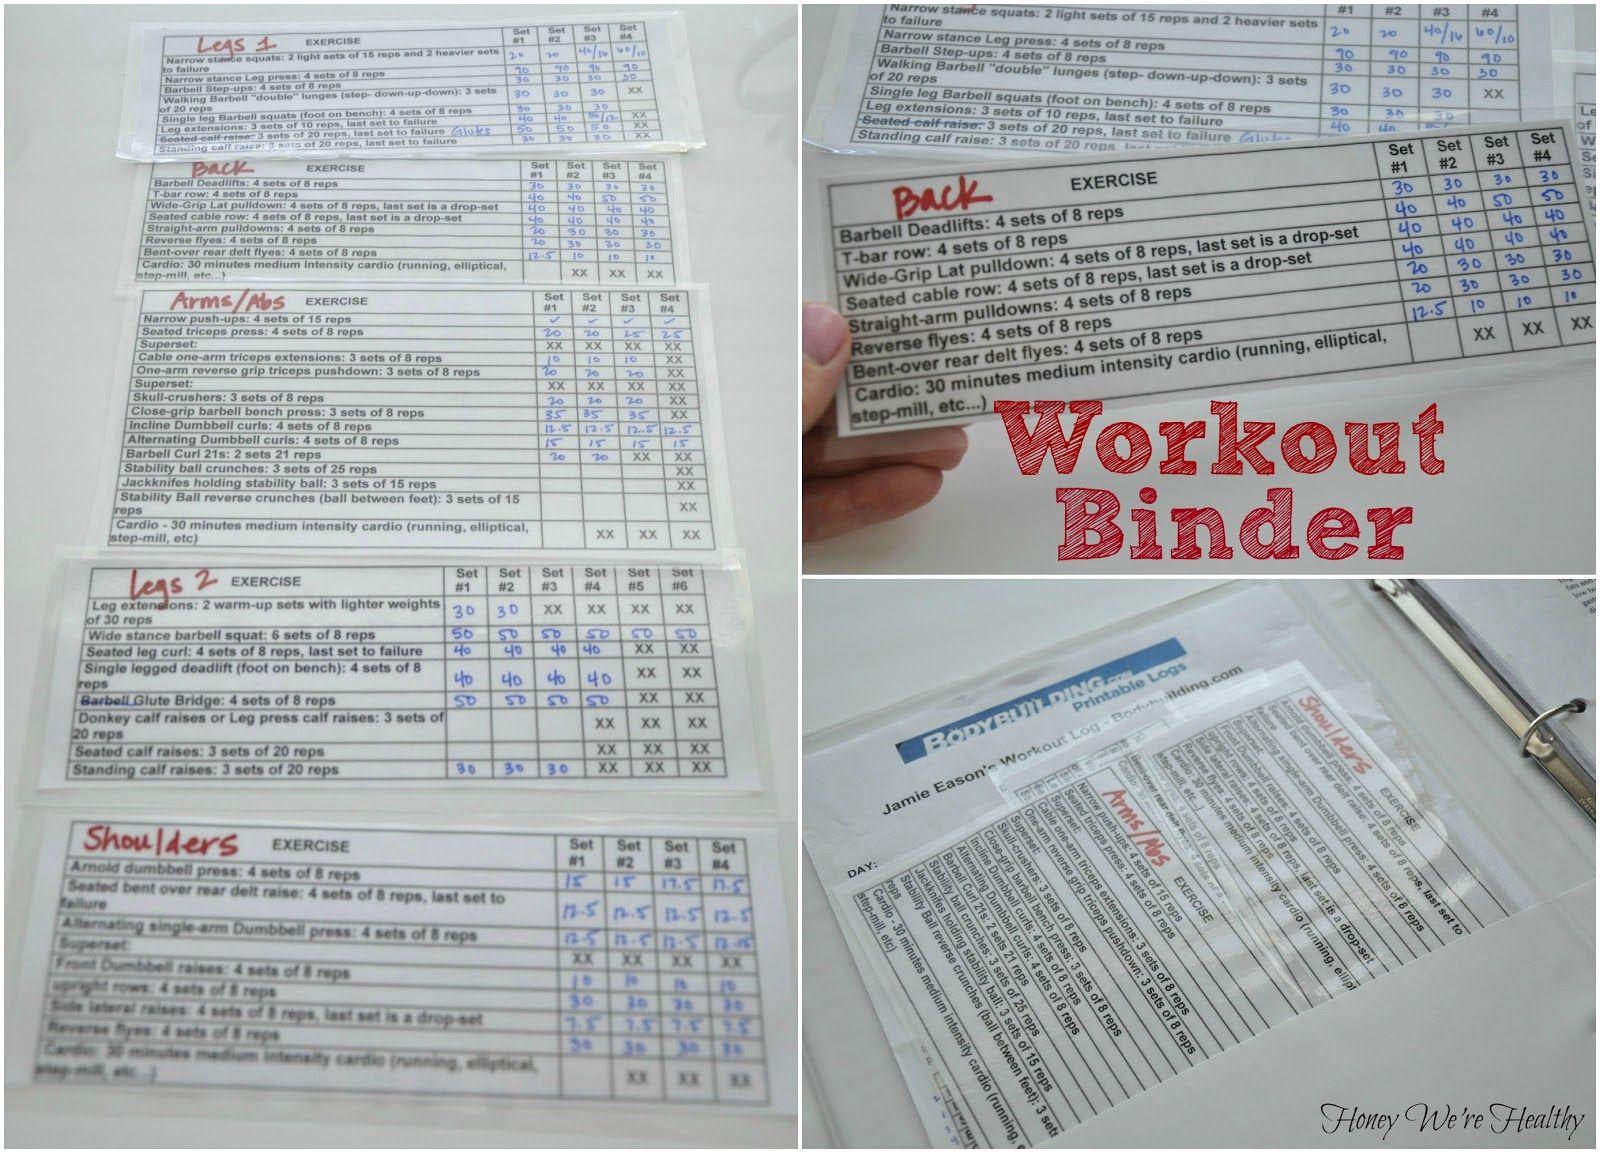 Honey Were Healthy Workout Binder Workouts Post 12 Week